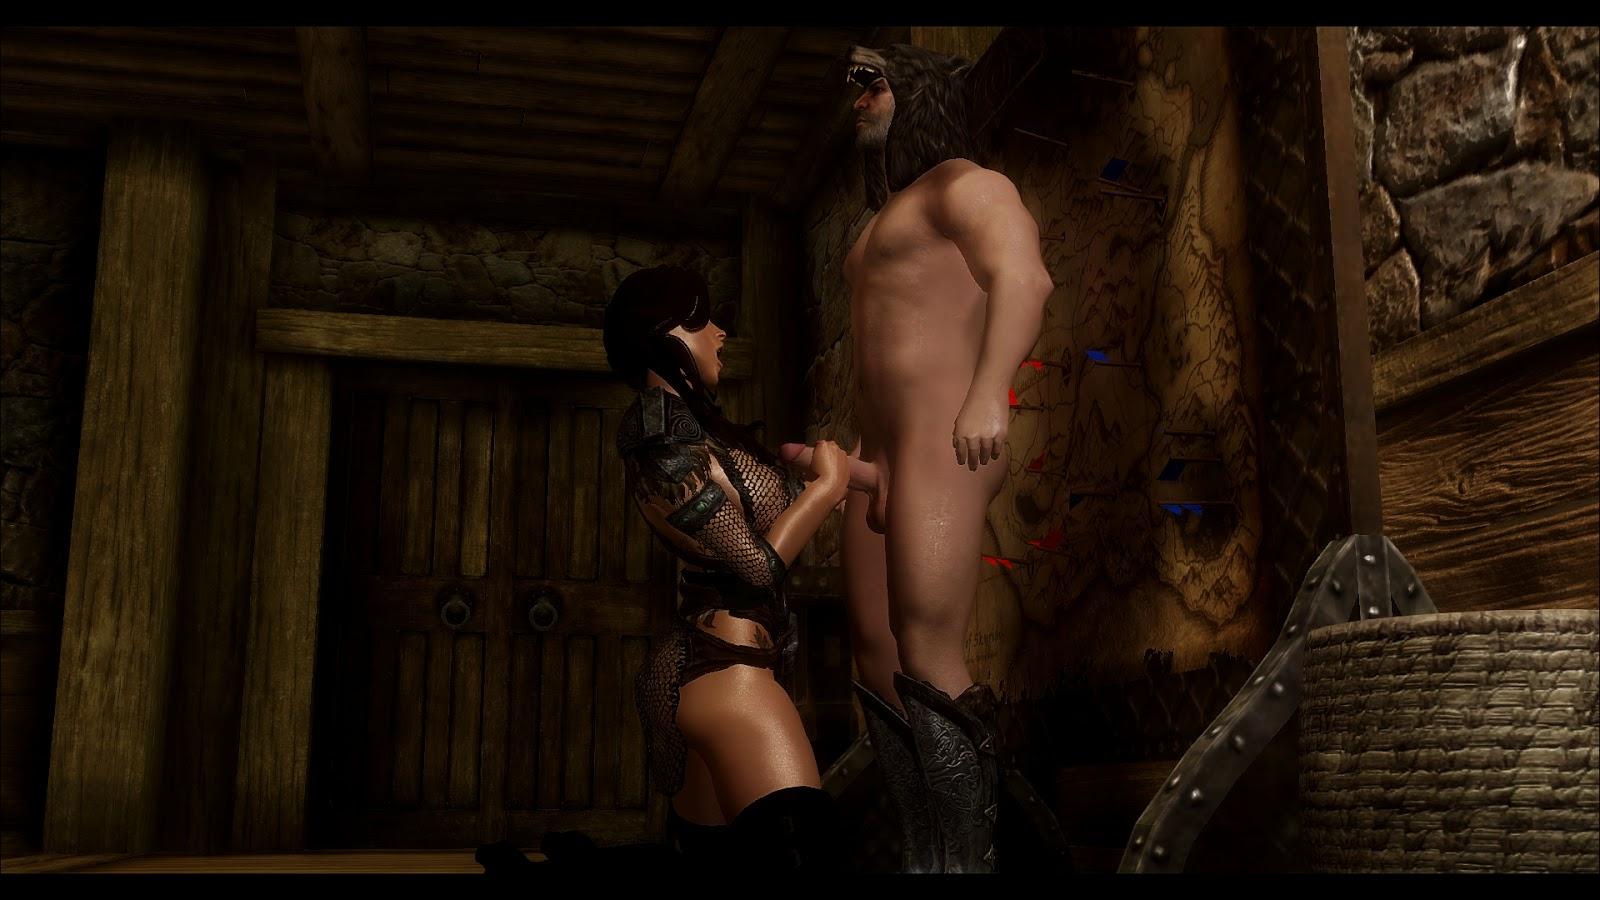 Porn tub gangbang video